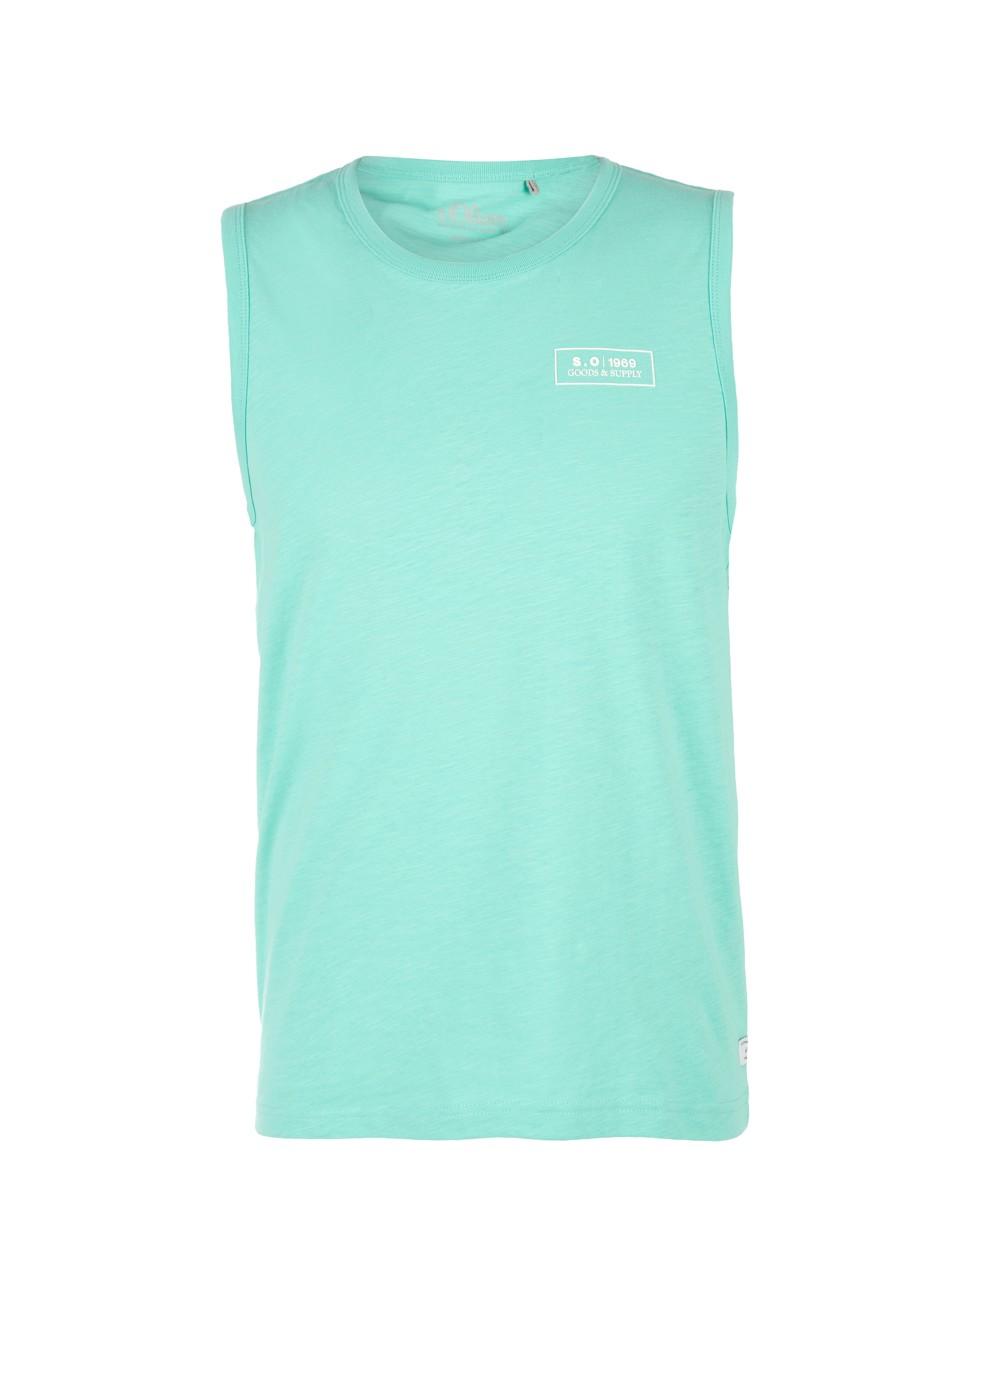 130 T-Shirt ?rmellos - Herren